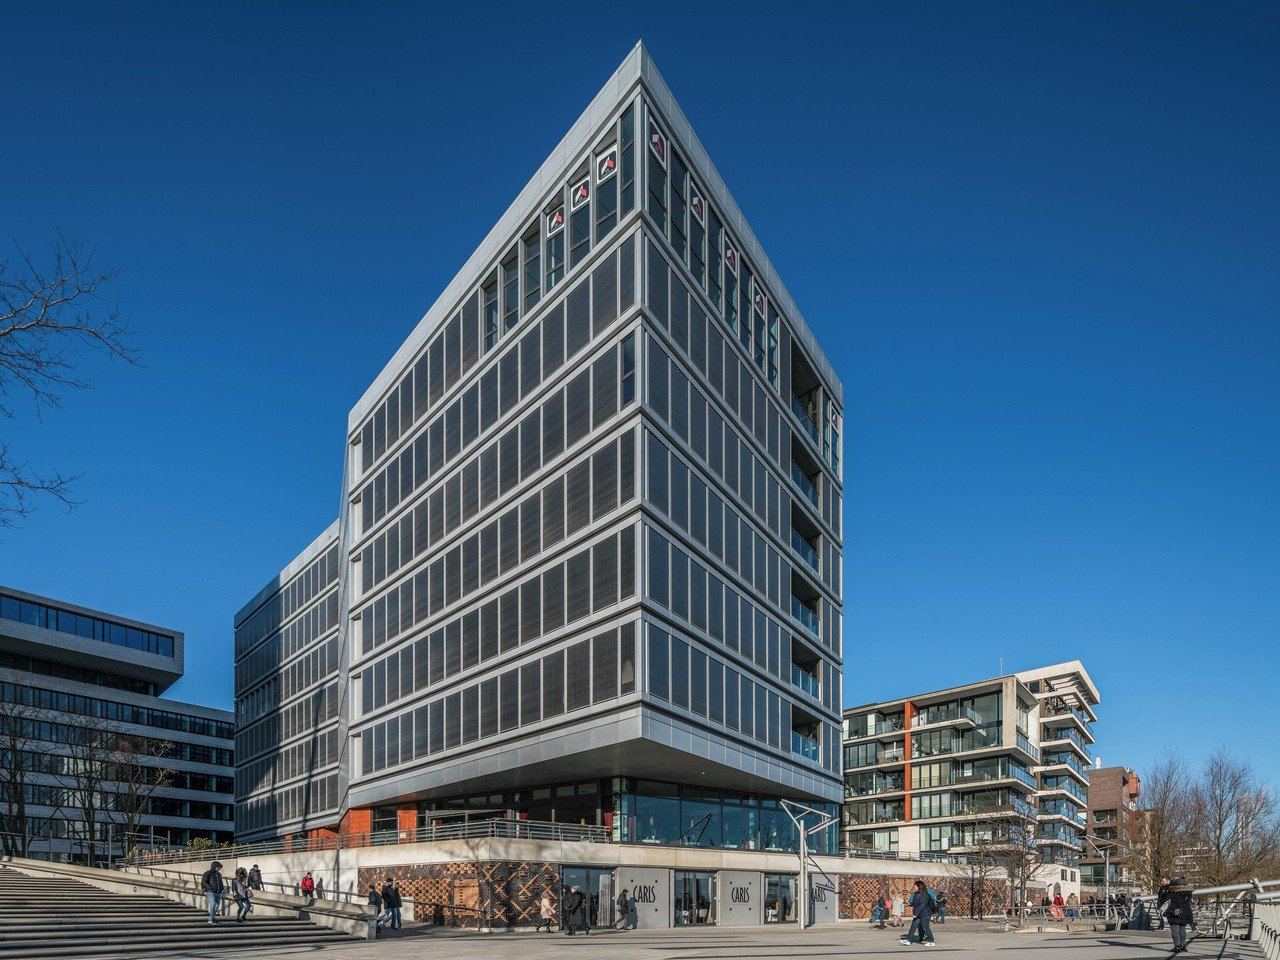 cs business center raum elphilharmonie mieten in hamburg. Black Bedroom Furniture Sets. Home Design Ideas